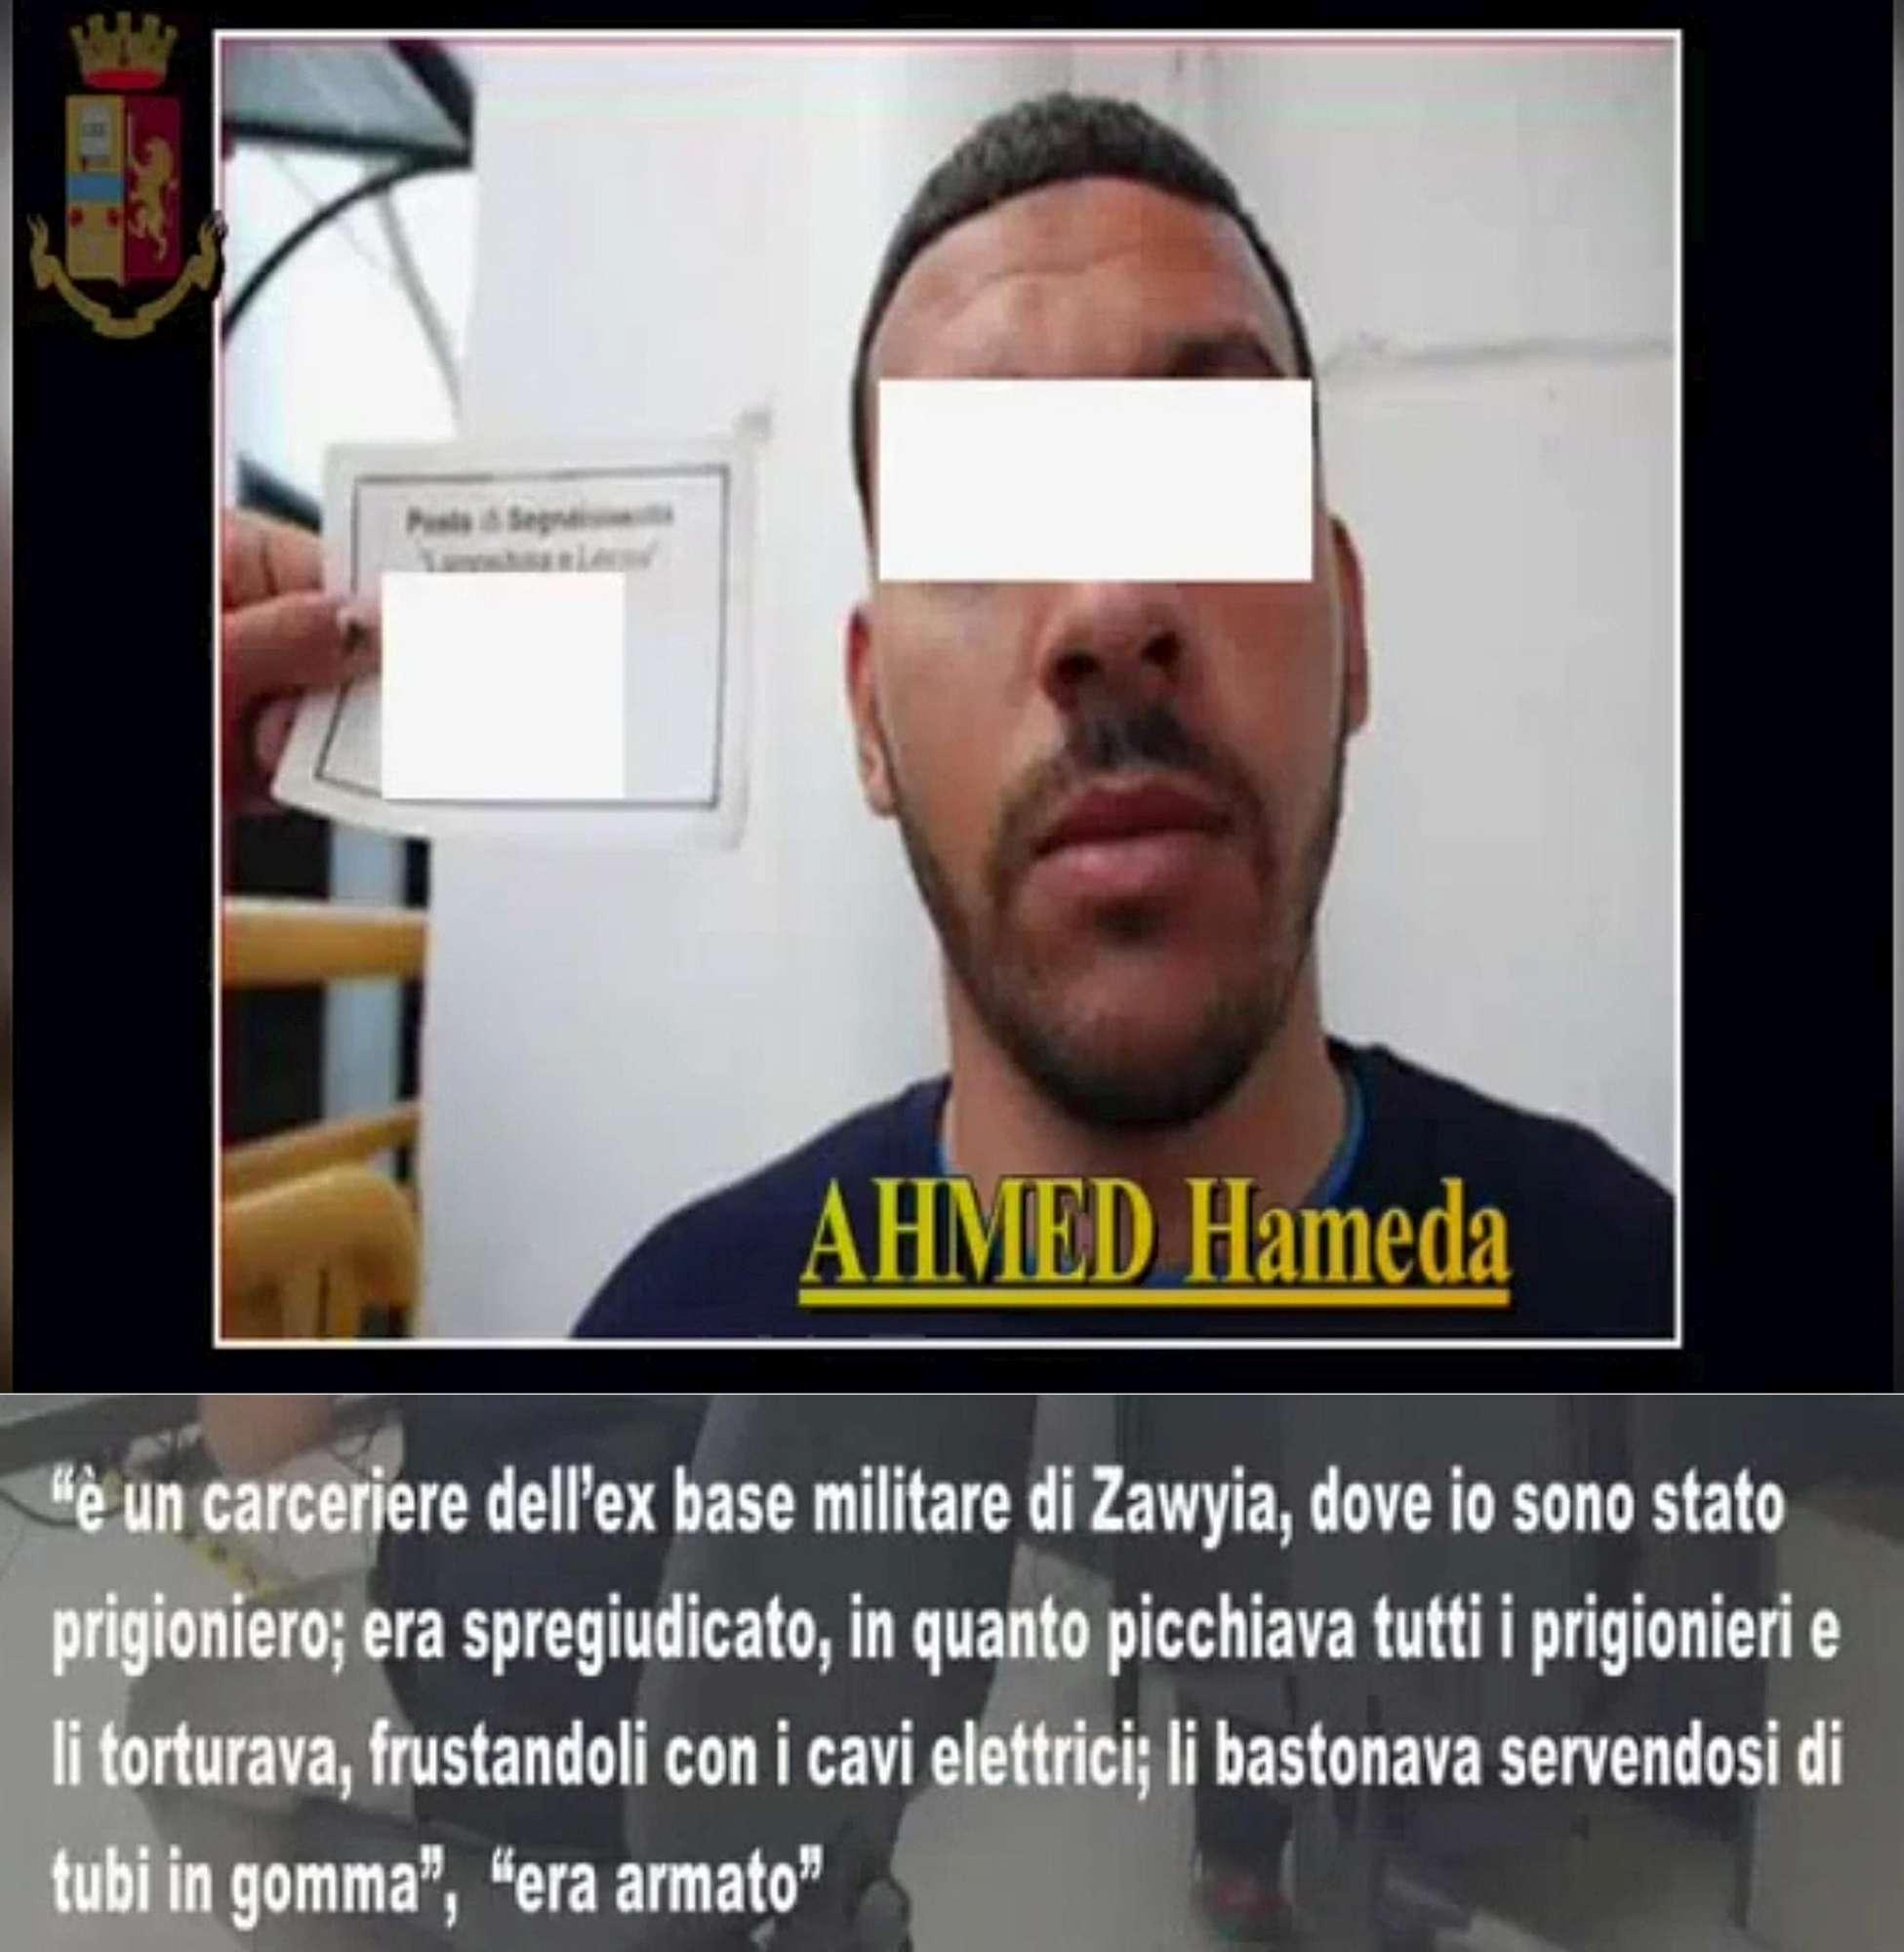 Migranti torturati e tenuti prigionieri in Libia, 3 fermi a Messina